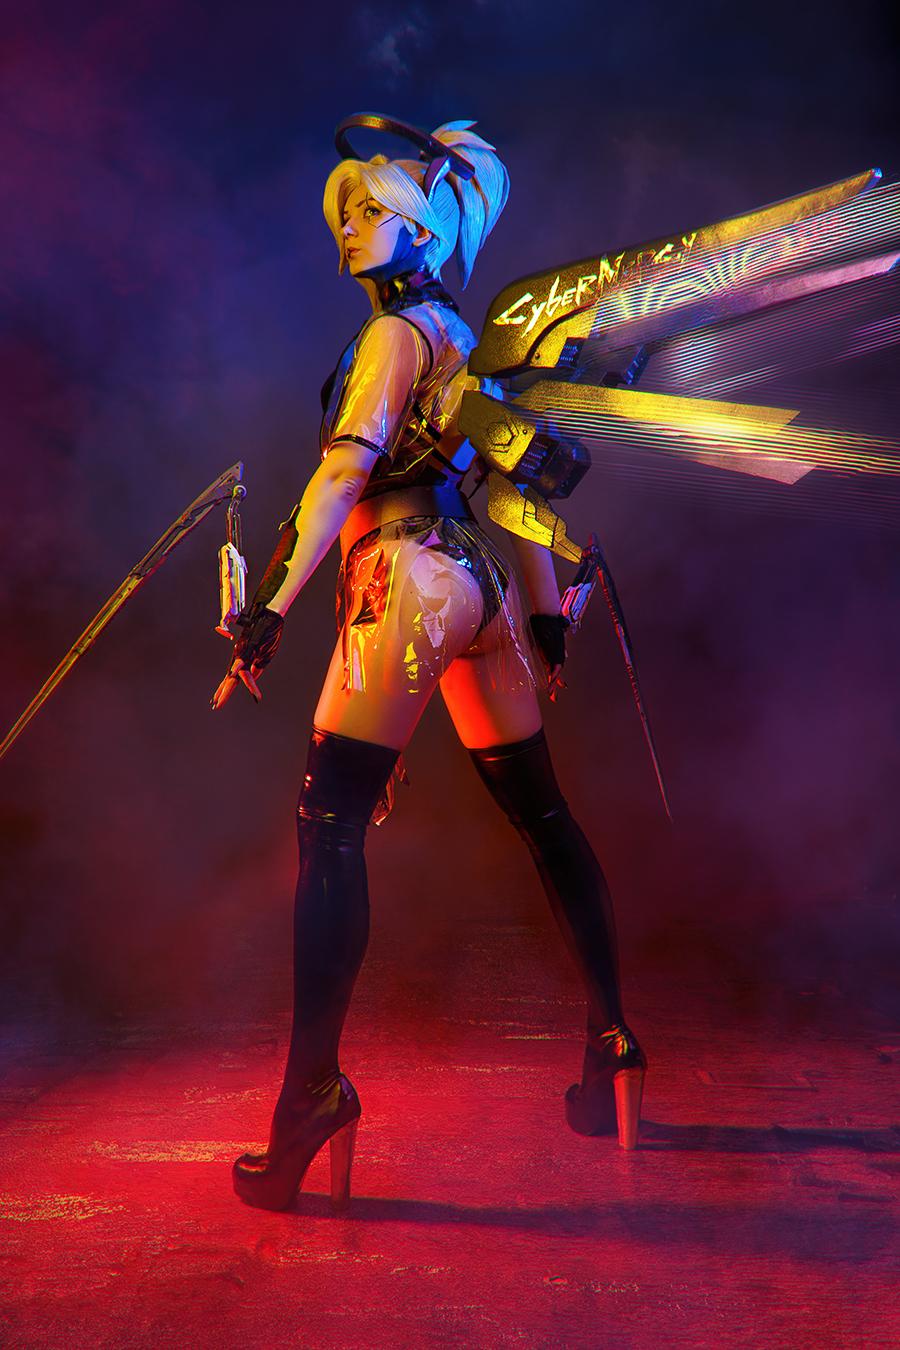 Mercy Cyberpunk Overwatch Cosplay BLIZZARD